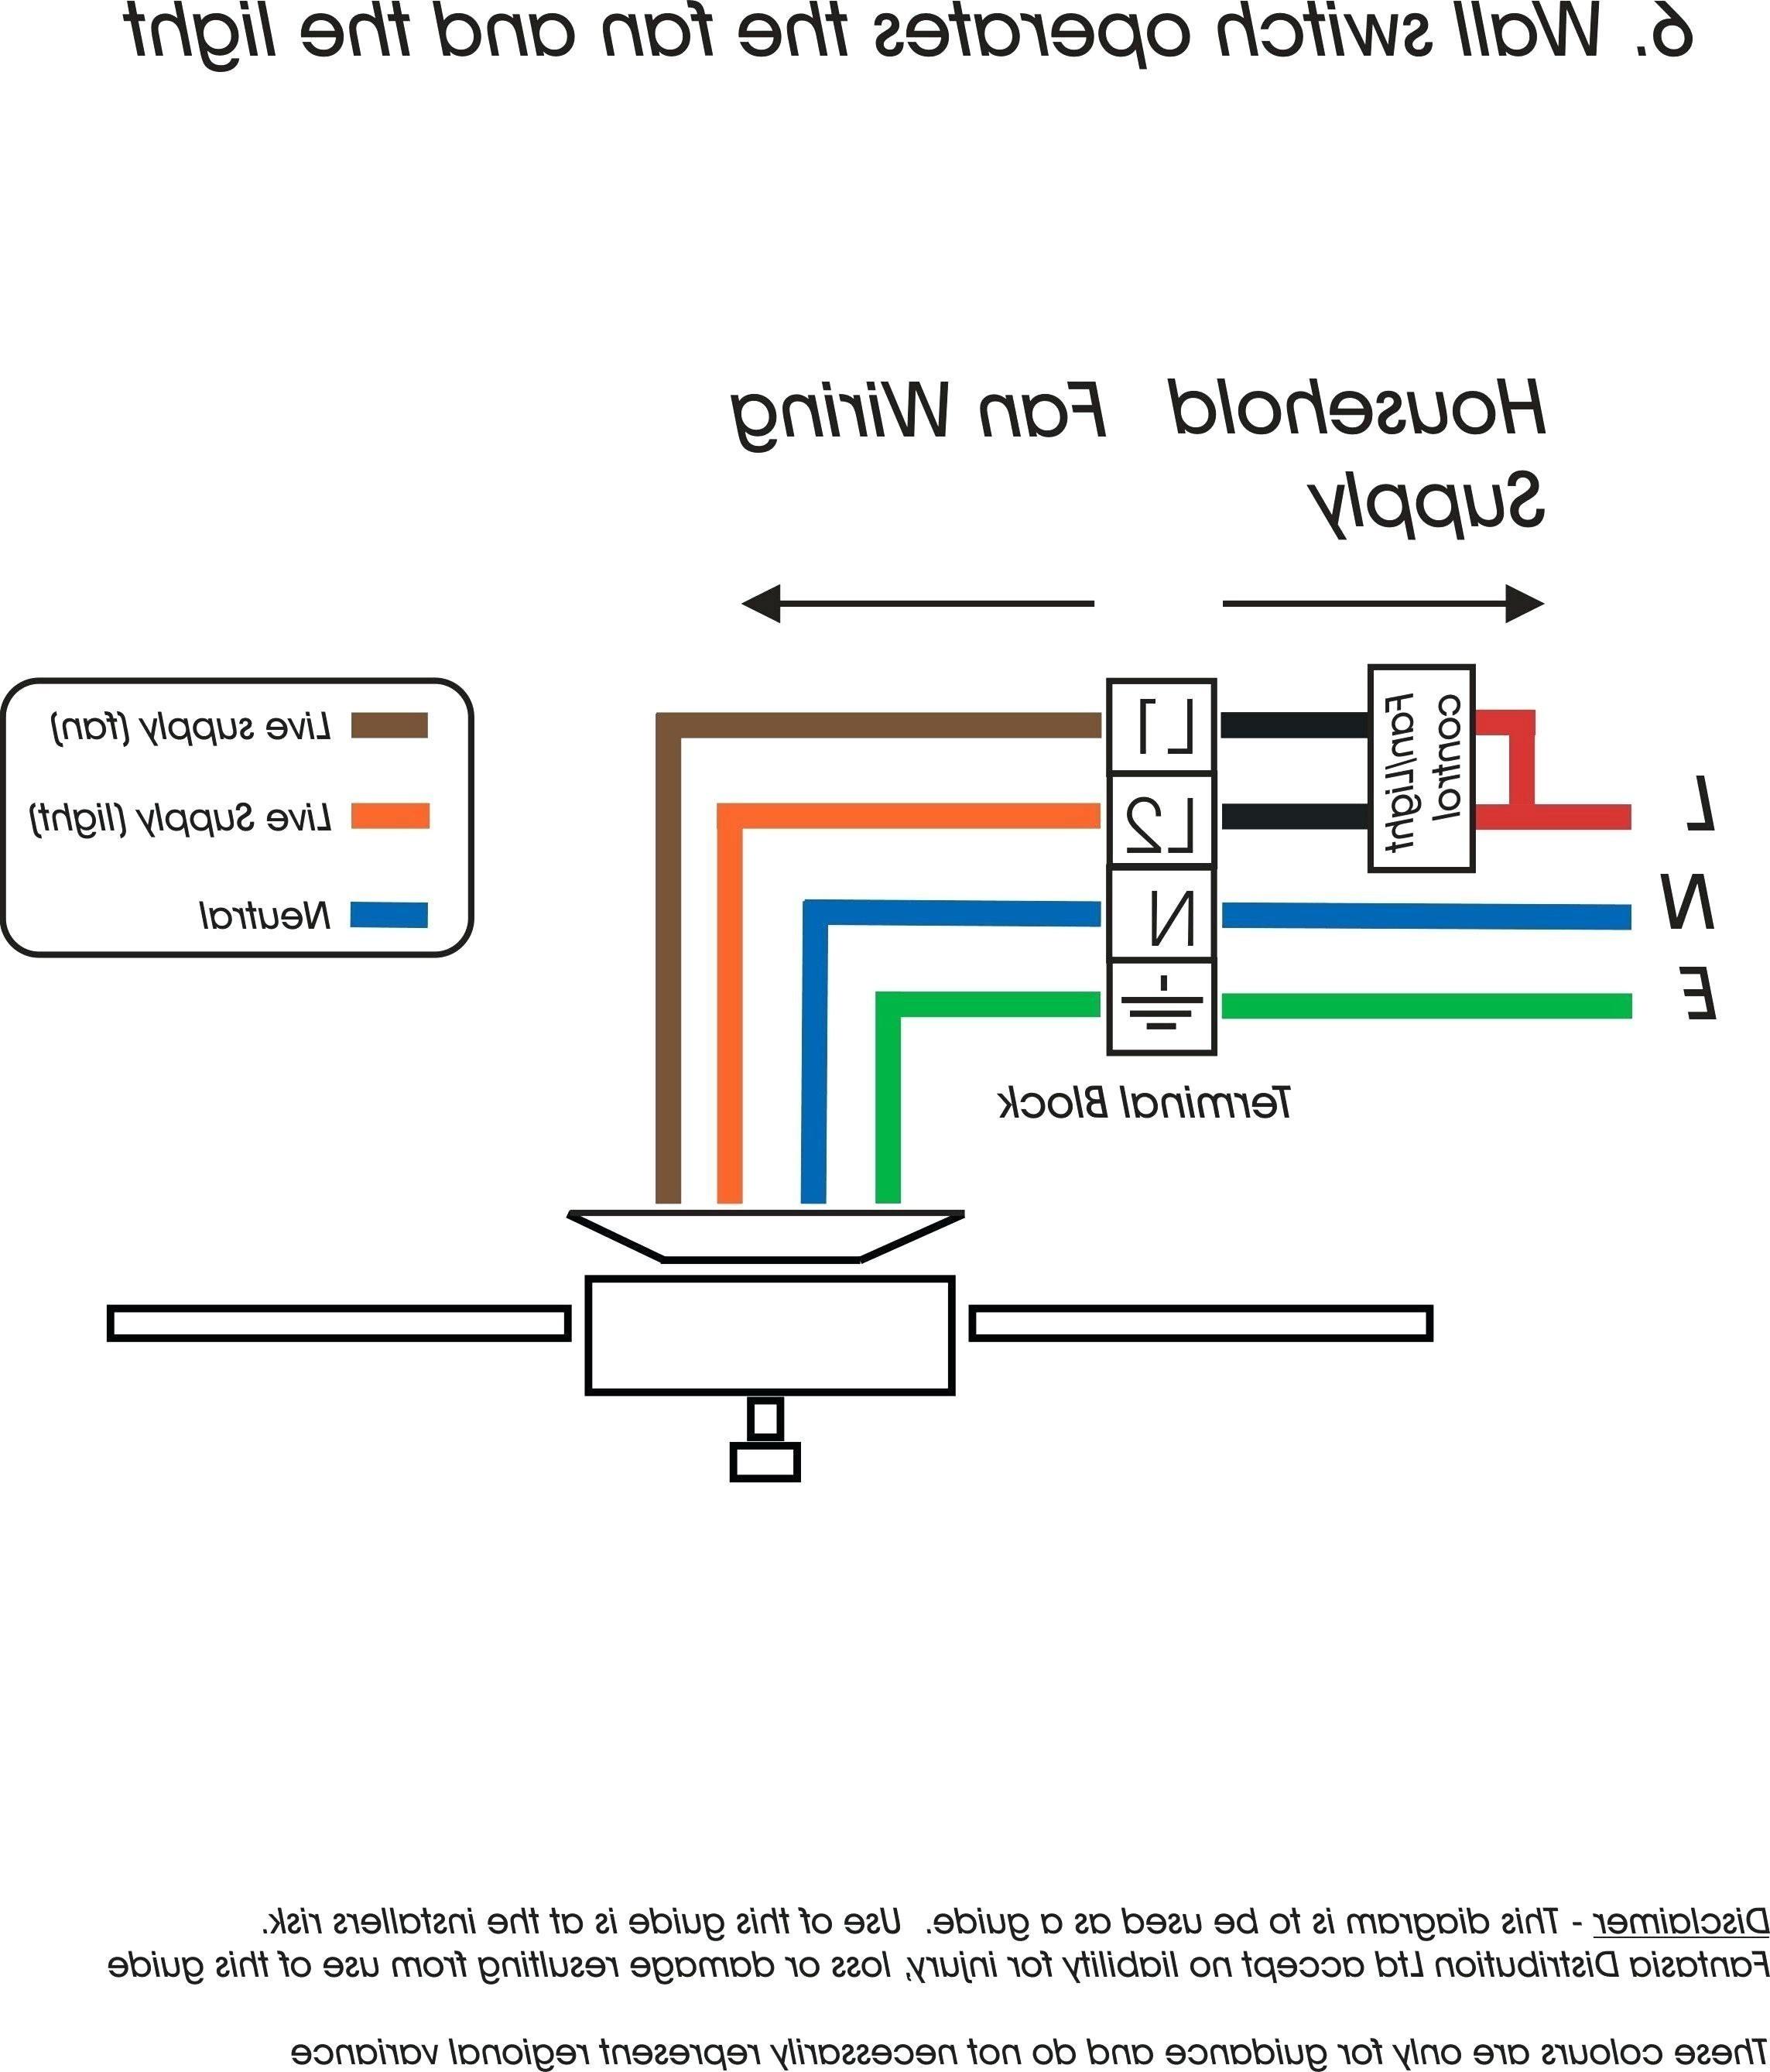 Dodge Ram Running Light Wiring Diagram Expert Schematics Subwoofer For Challenger Unique 2006 1500 Image 1970